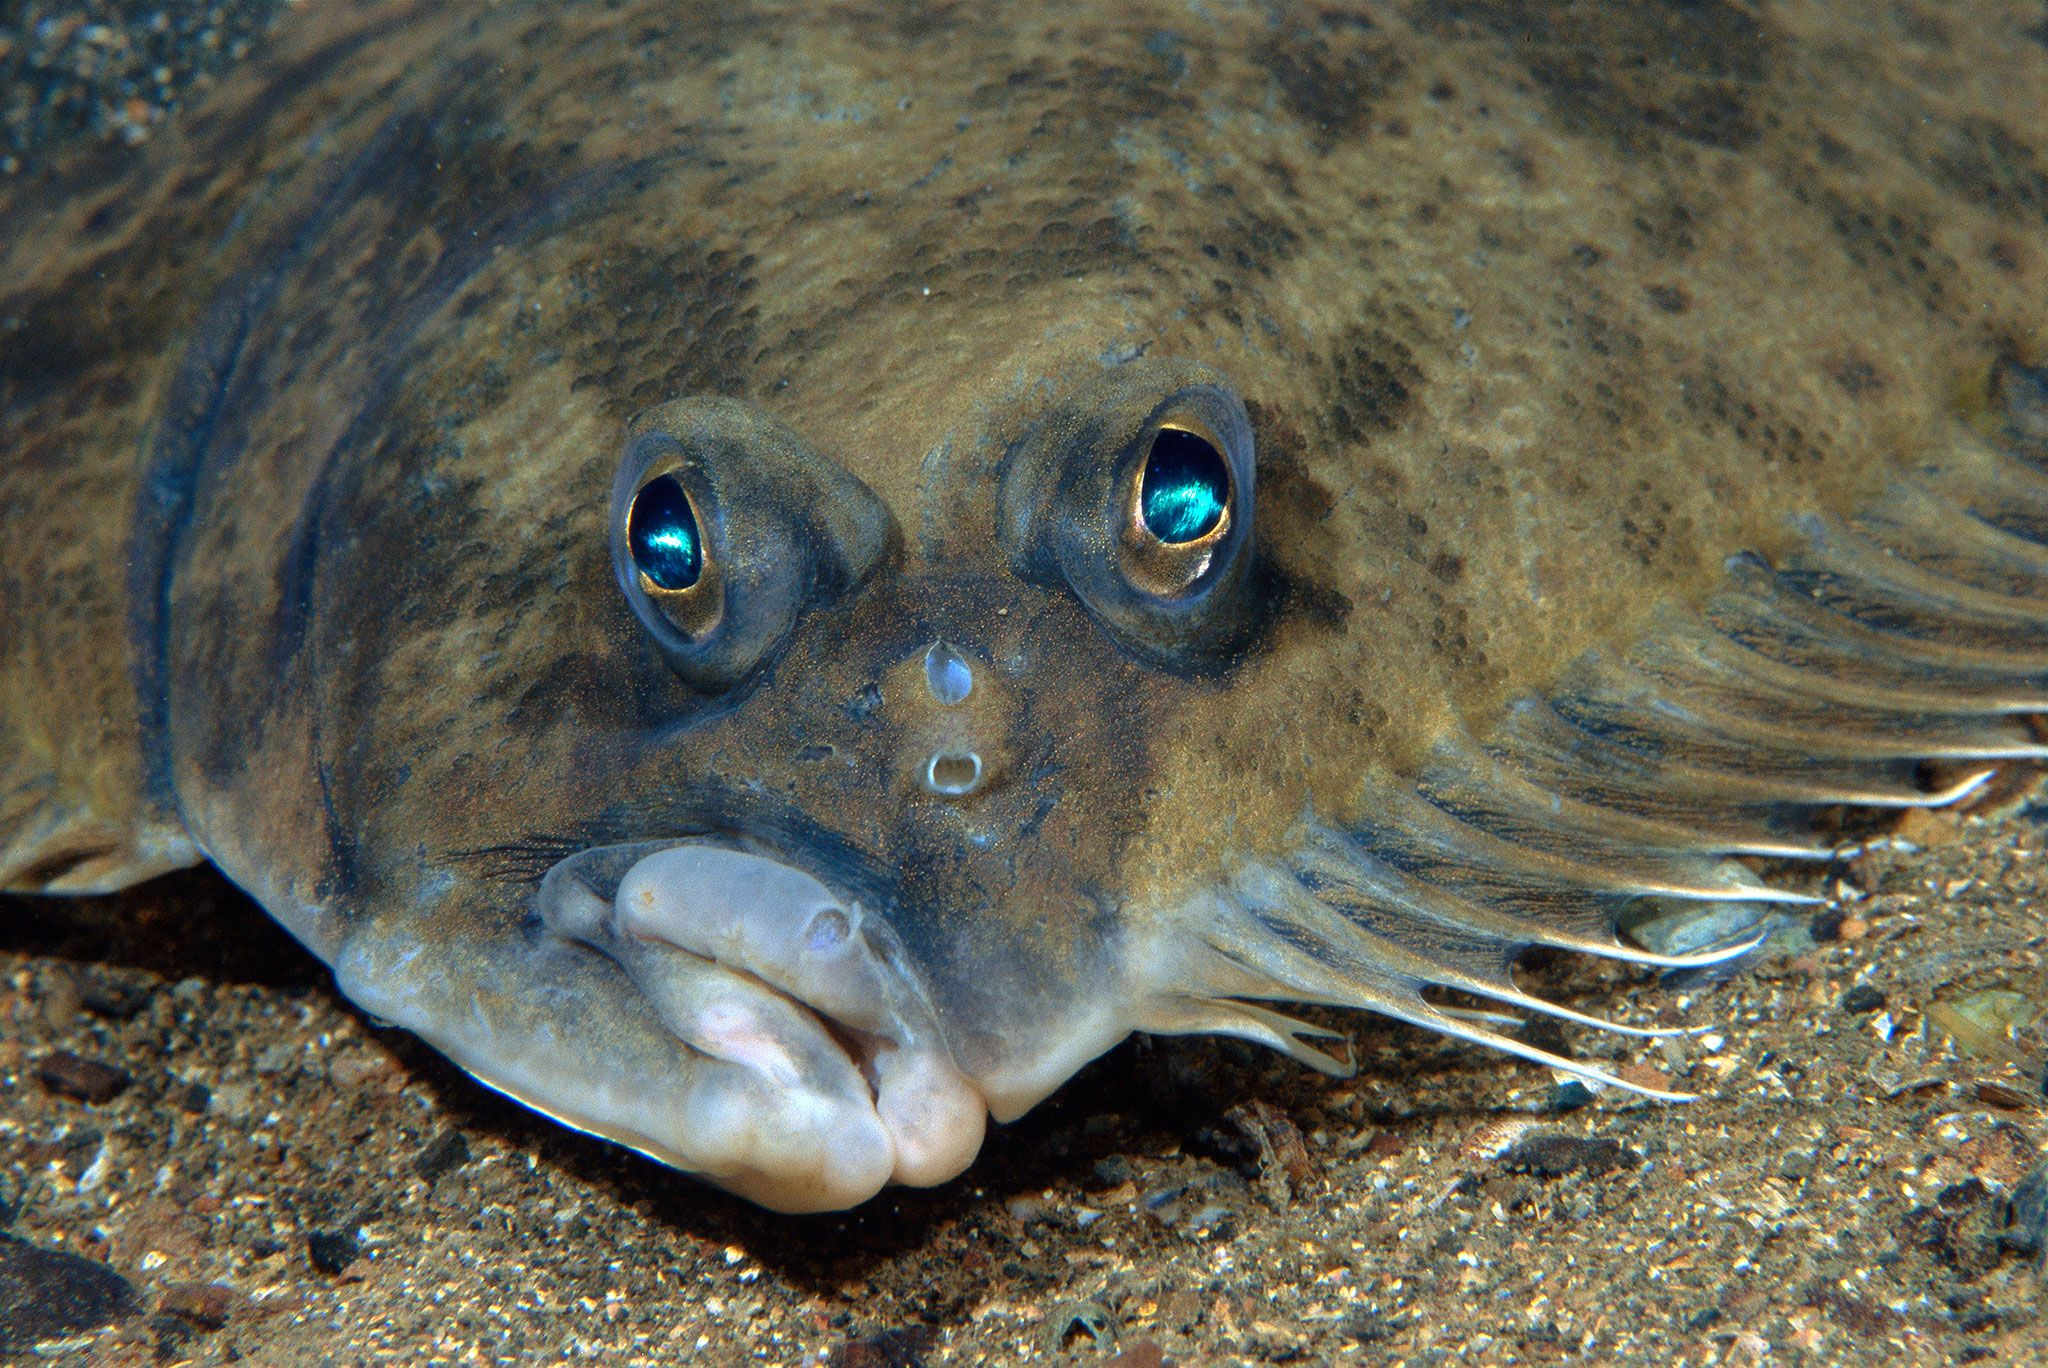 Flounders Eyes Face Skyward How Do They See The Ocean Floor Flounder Fishing Animals Fish